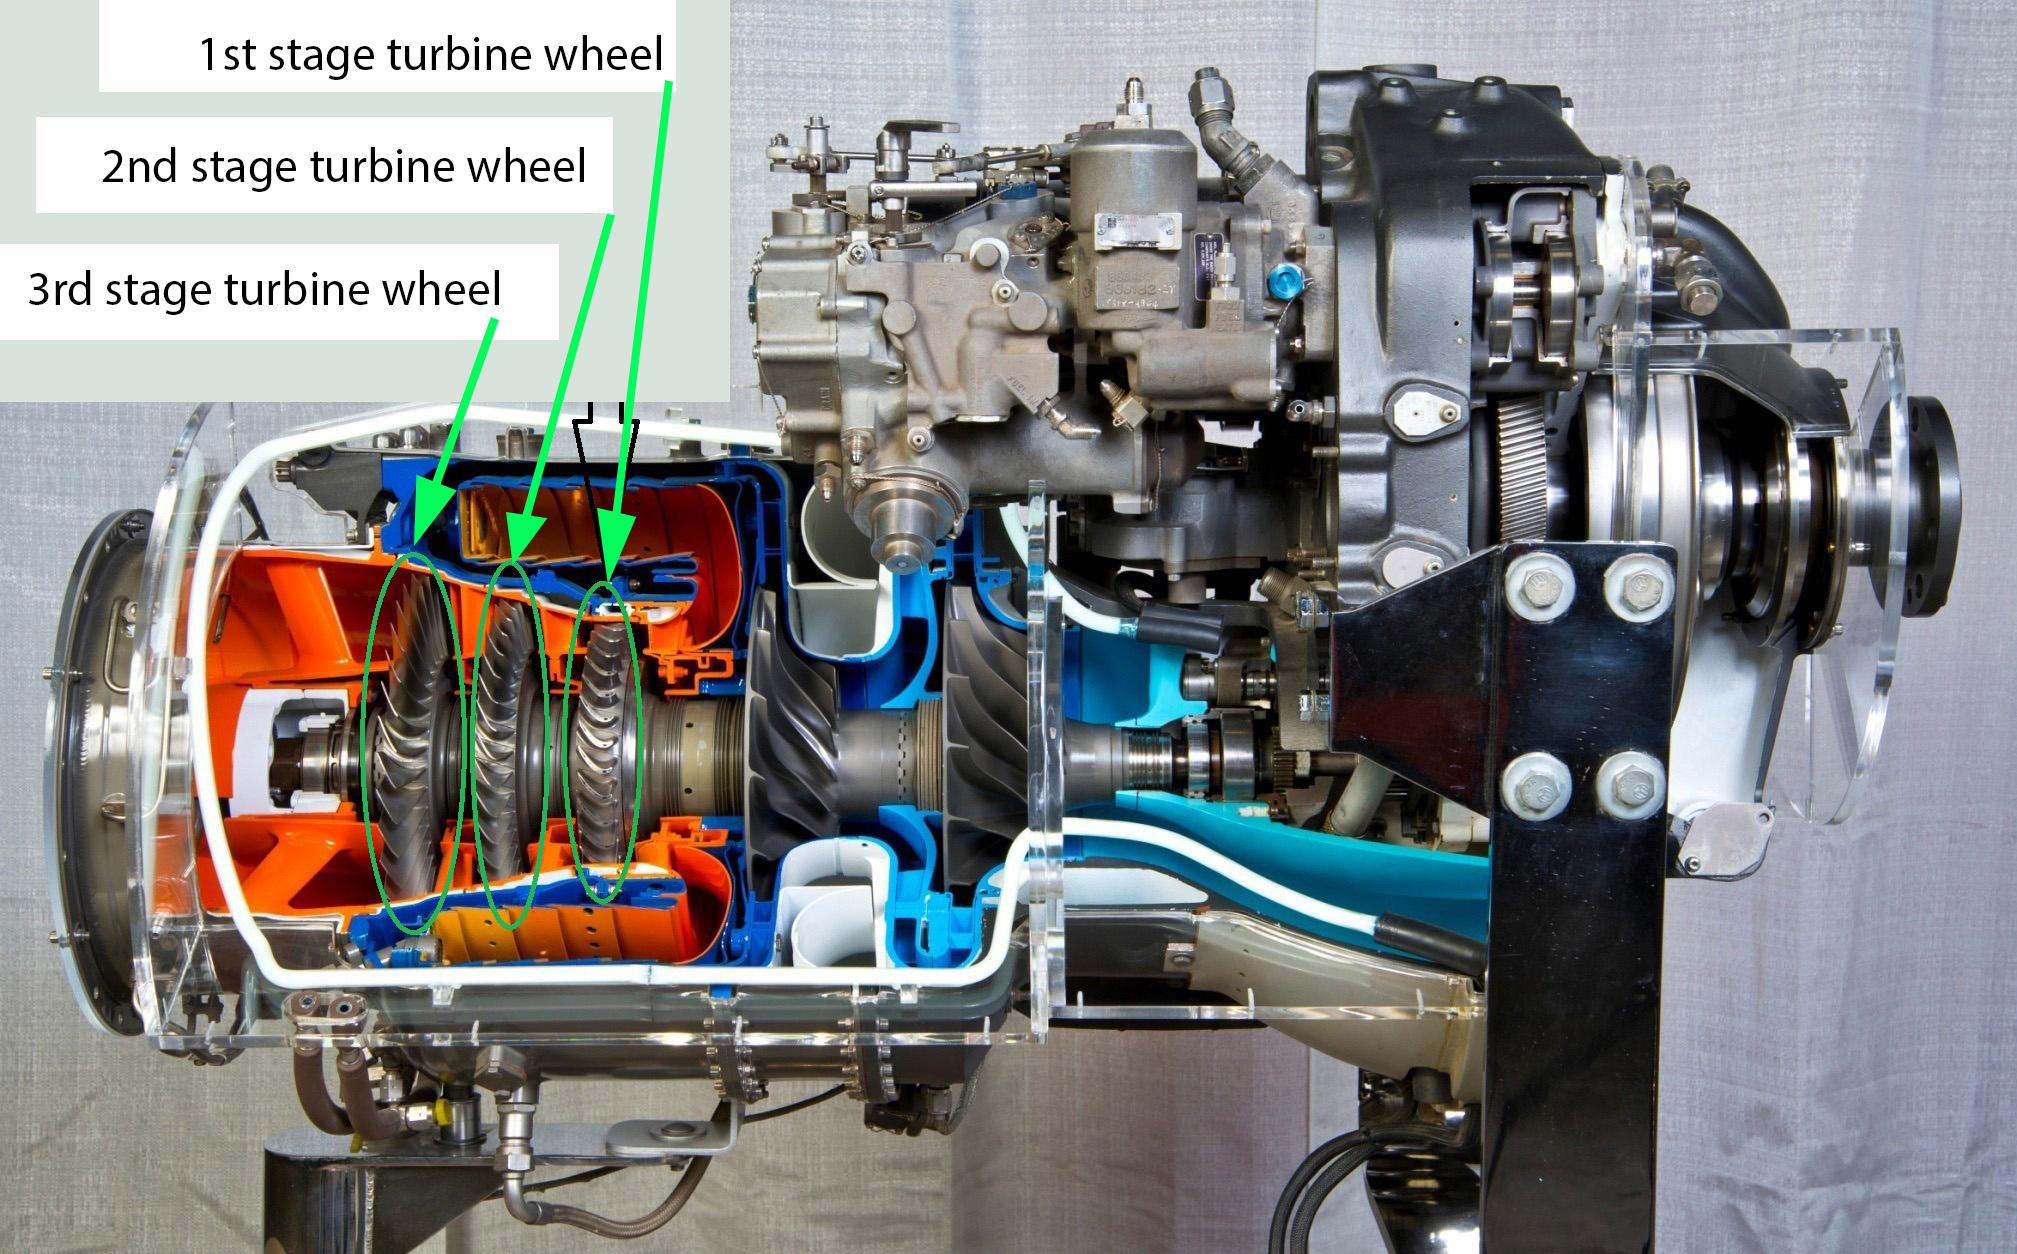 tpe331 engine schematics example electrical wiring diagram u2022 rh 162 212 157 63 Honeywell TPE331 10 Engine TPE 331 GIF